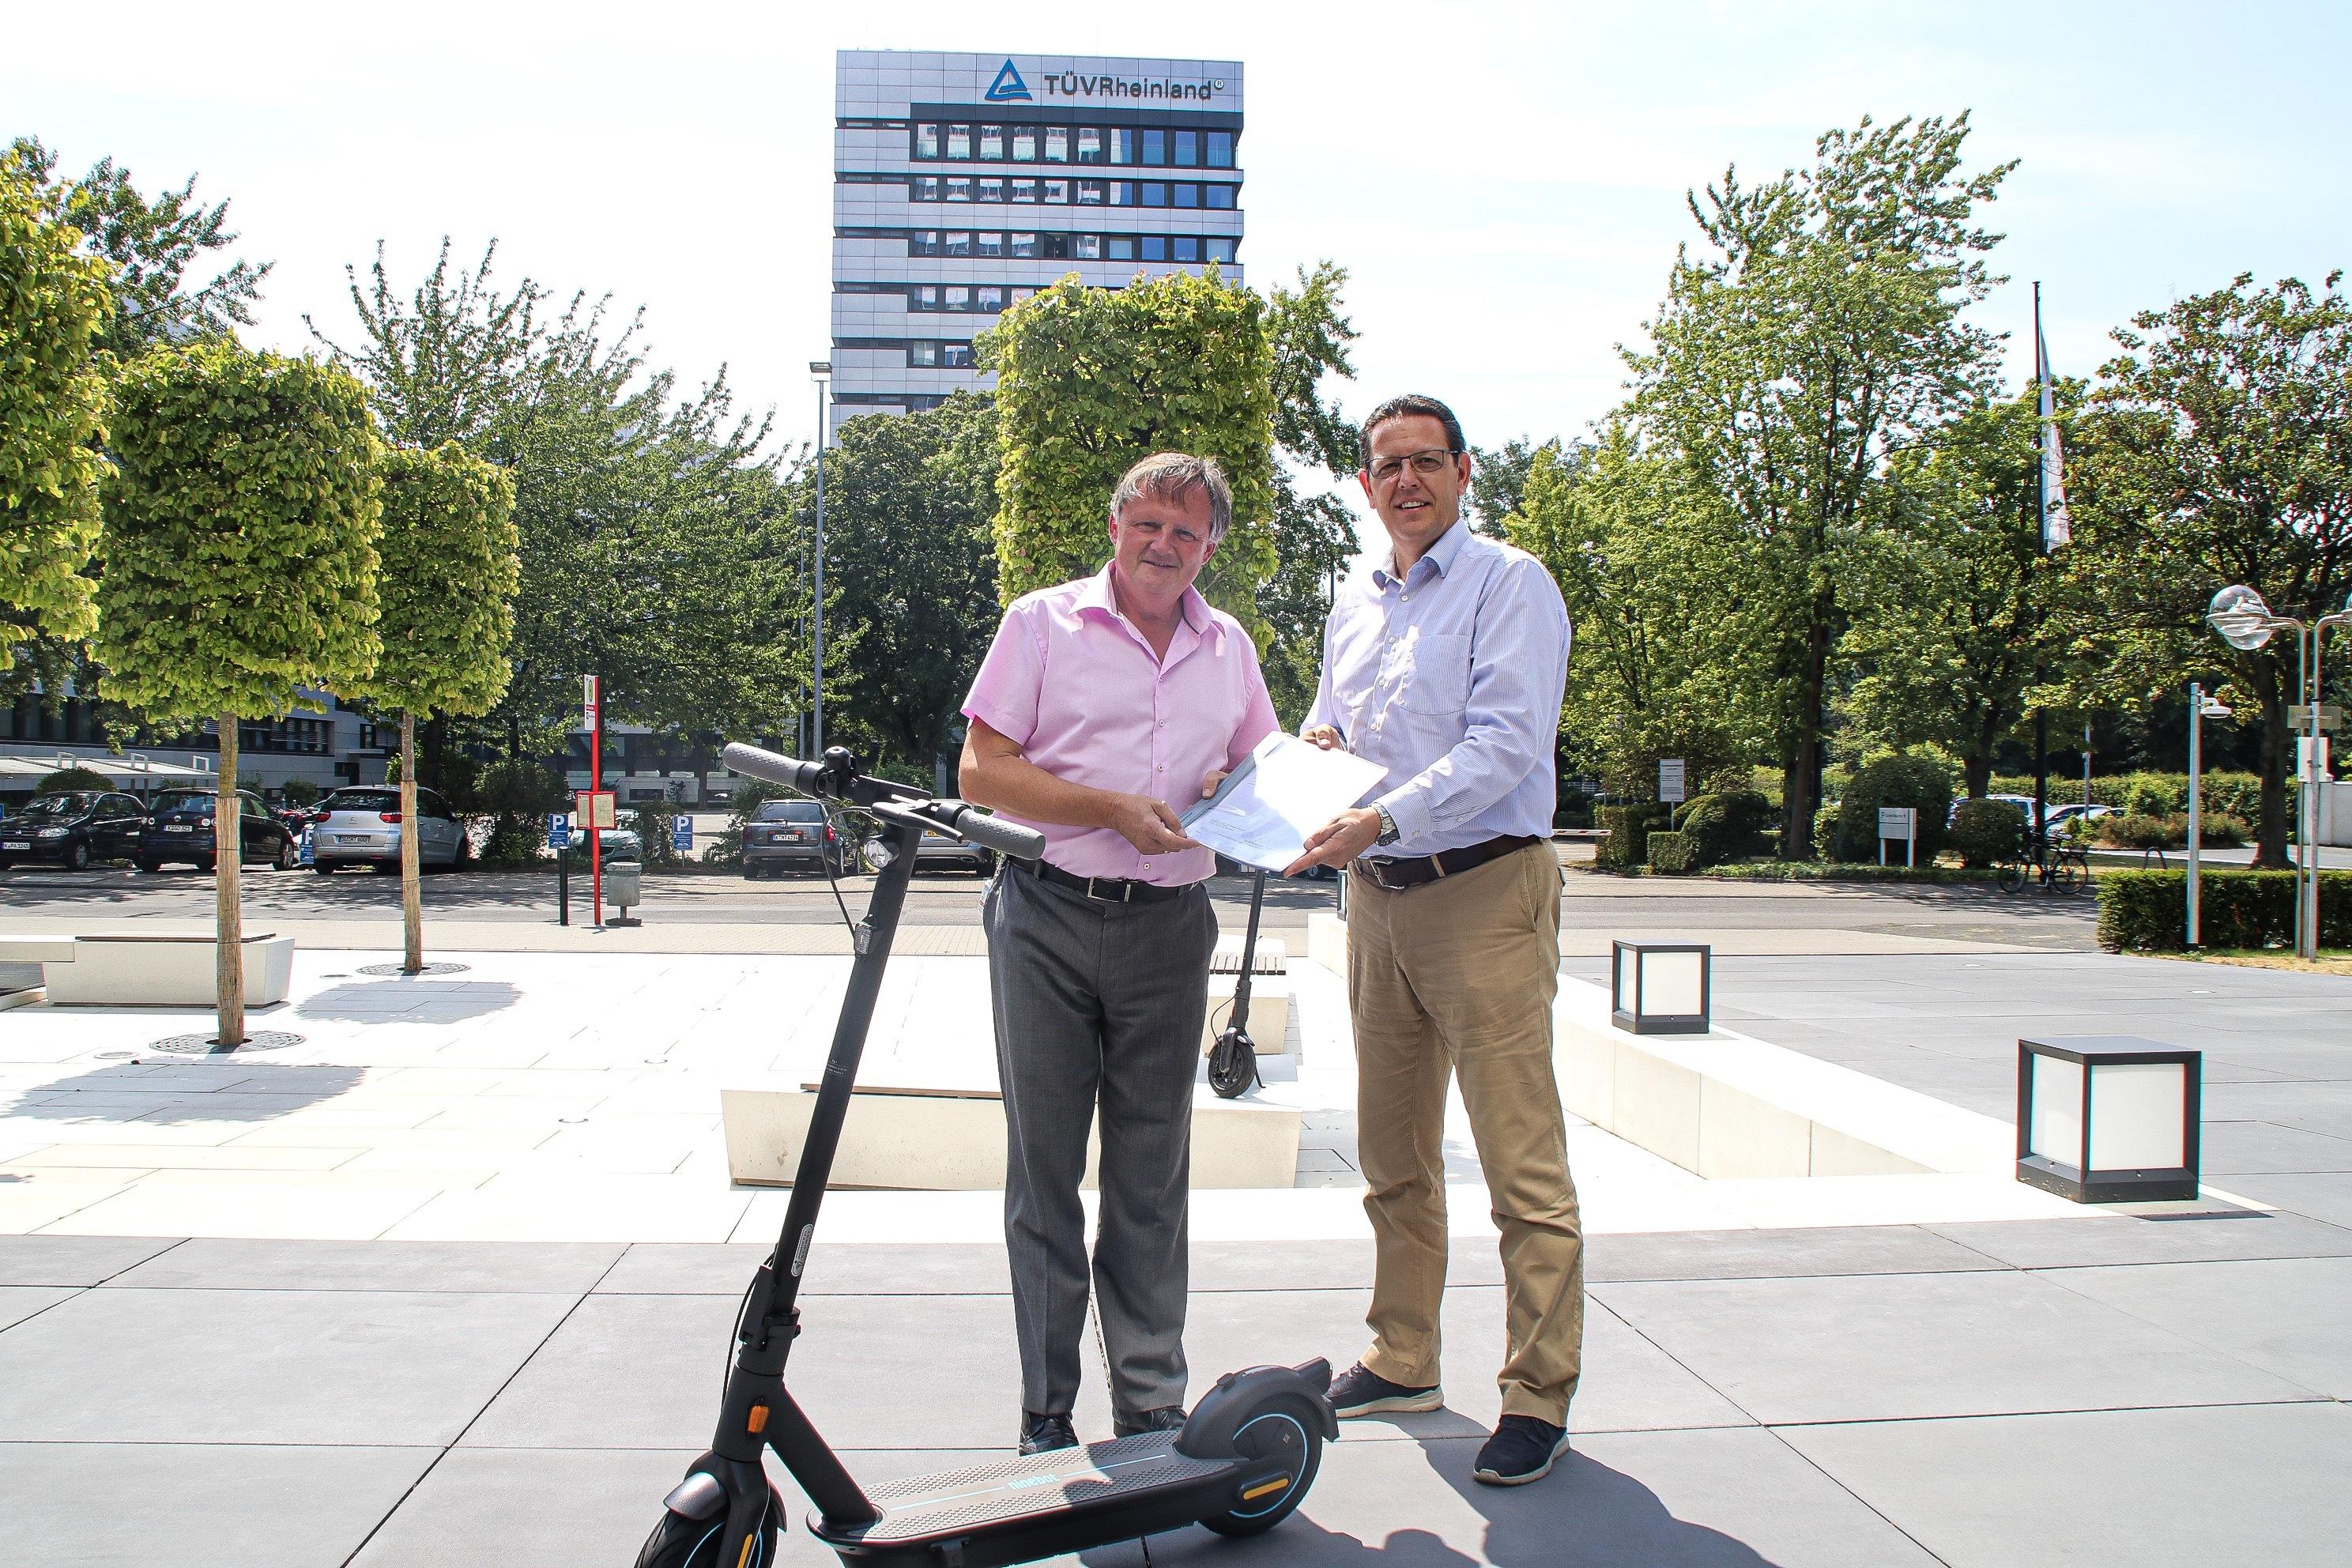 Segway-Ninebot Electric Scooters Granted German eKFV